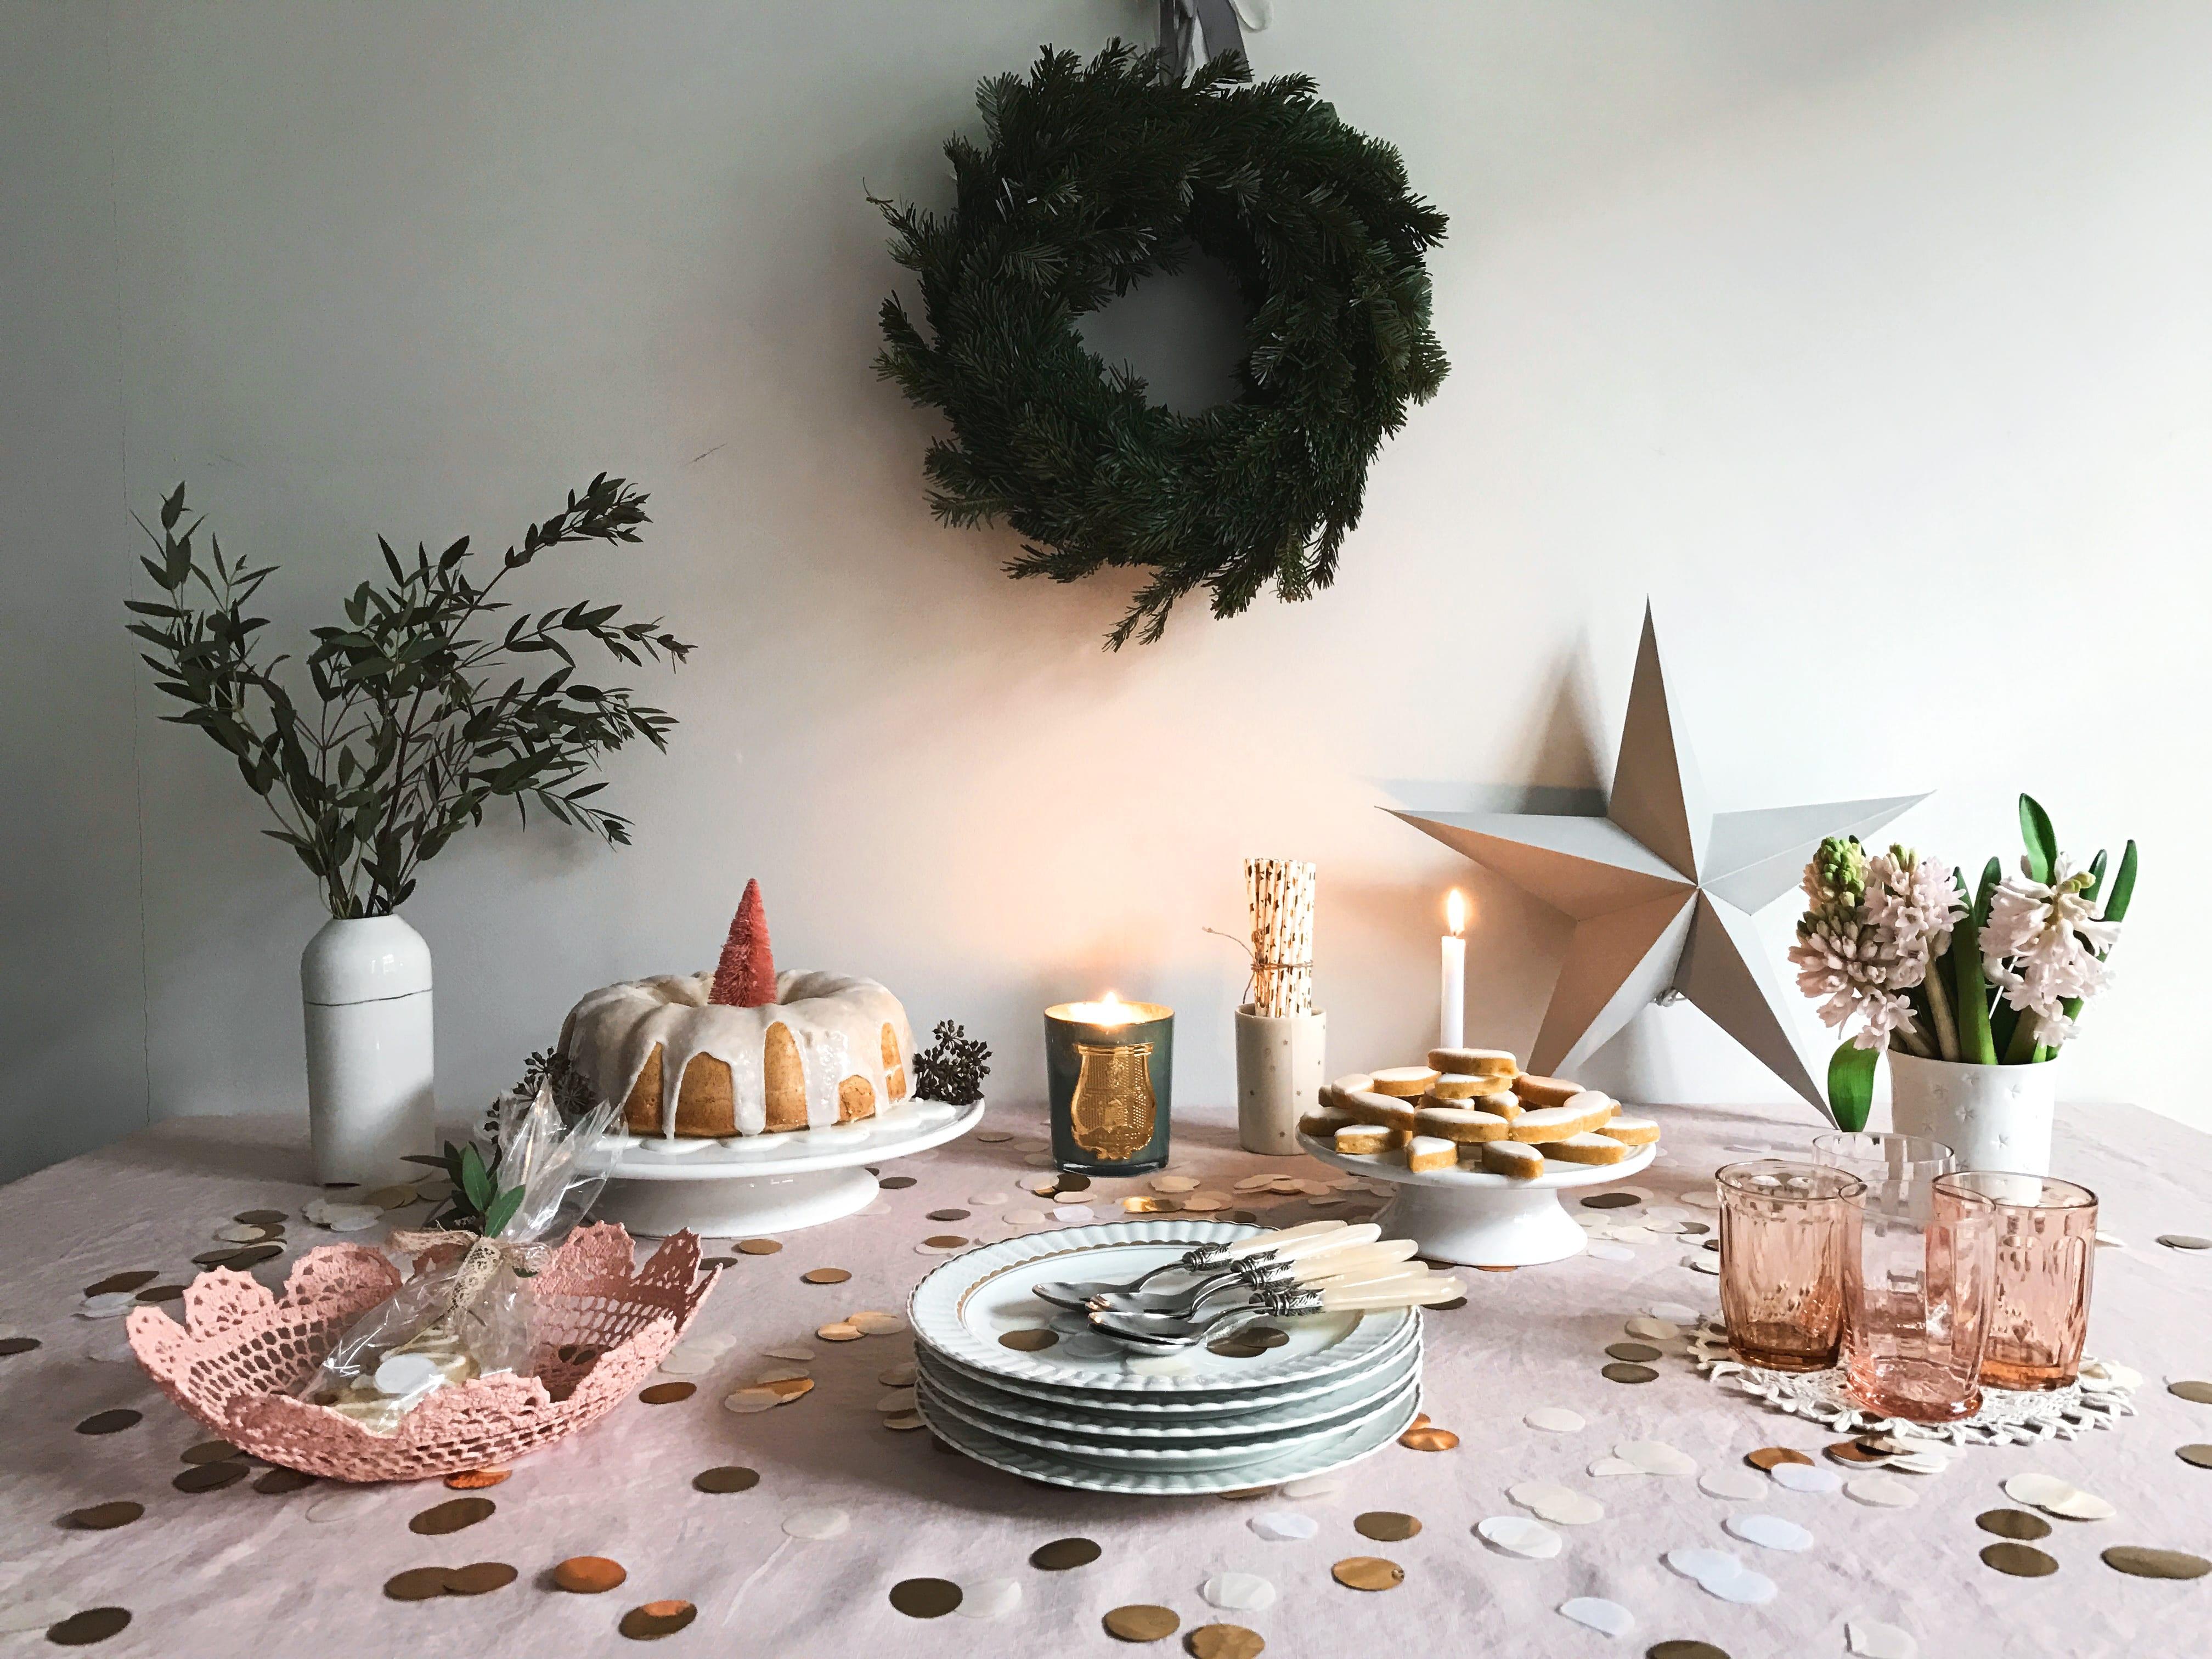 Ma table gourmande de fêtes.